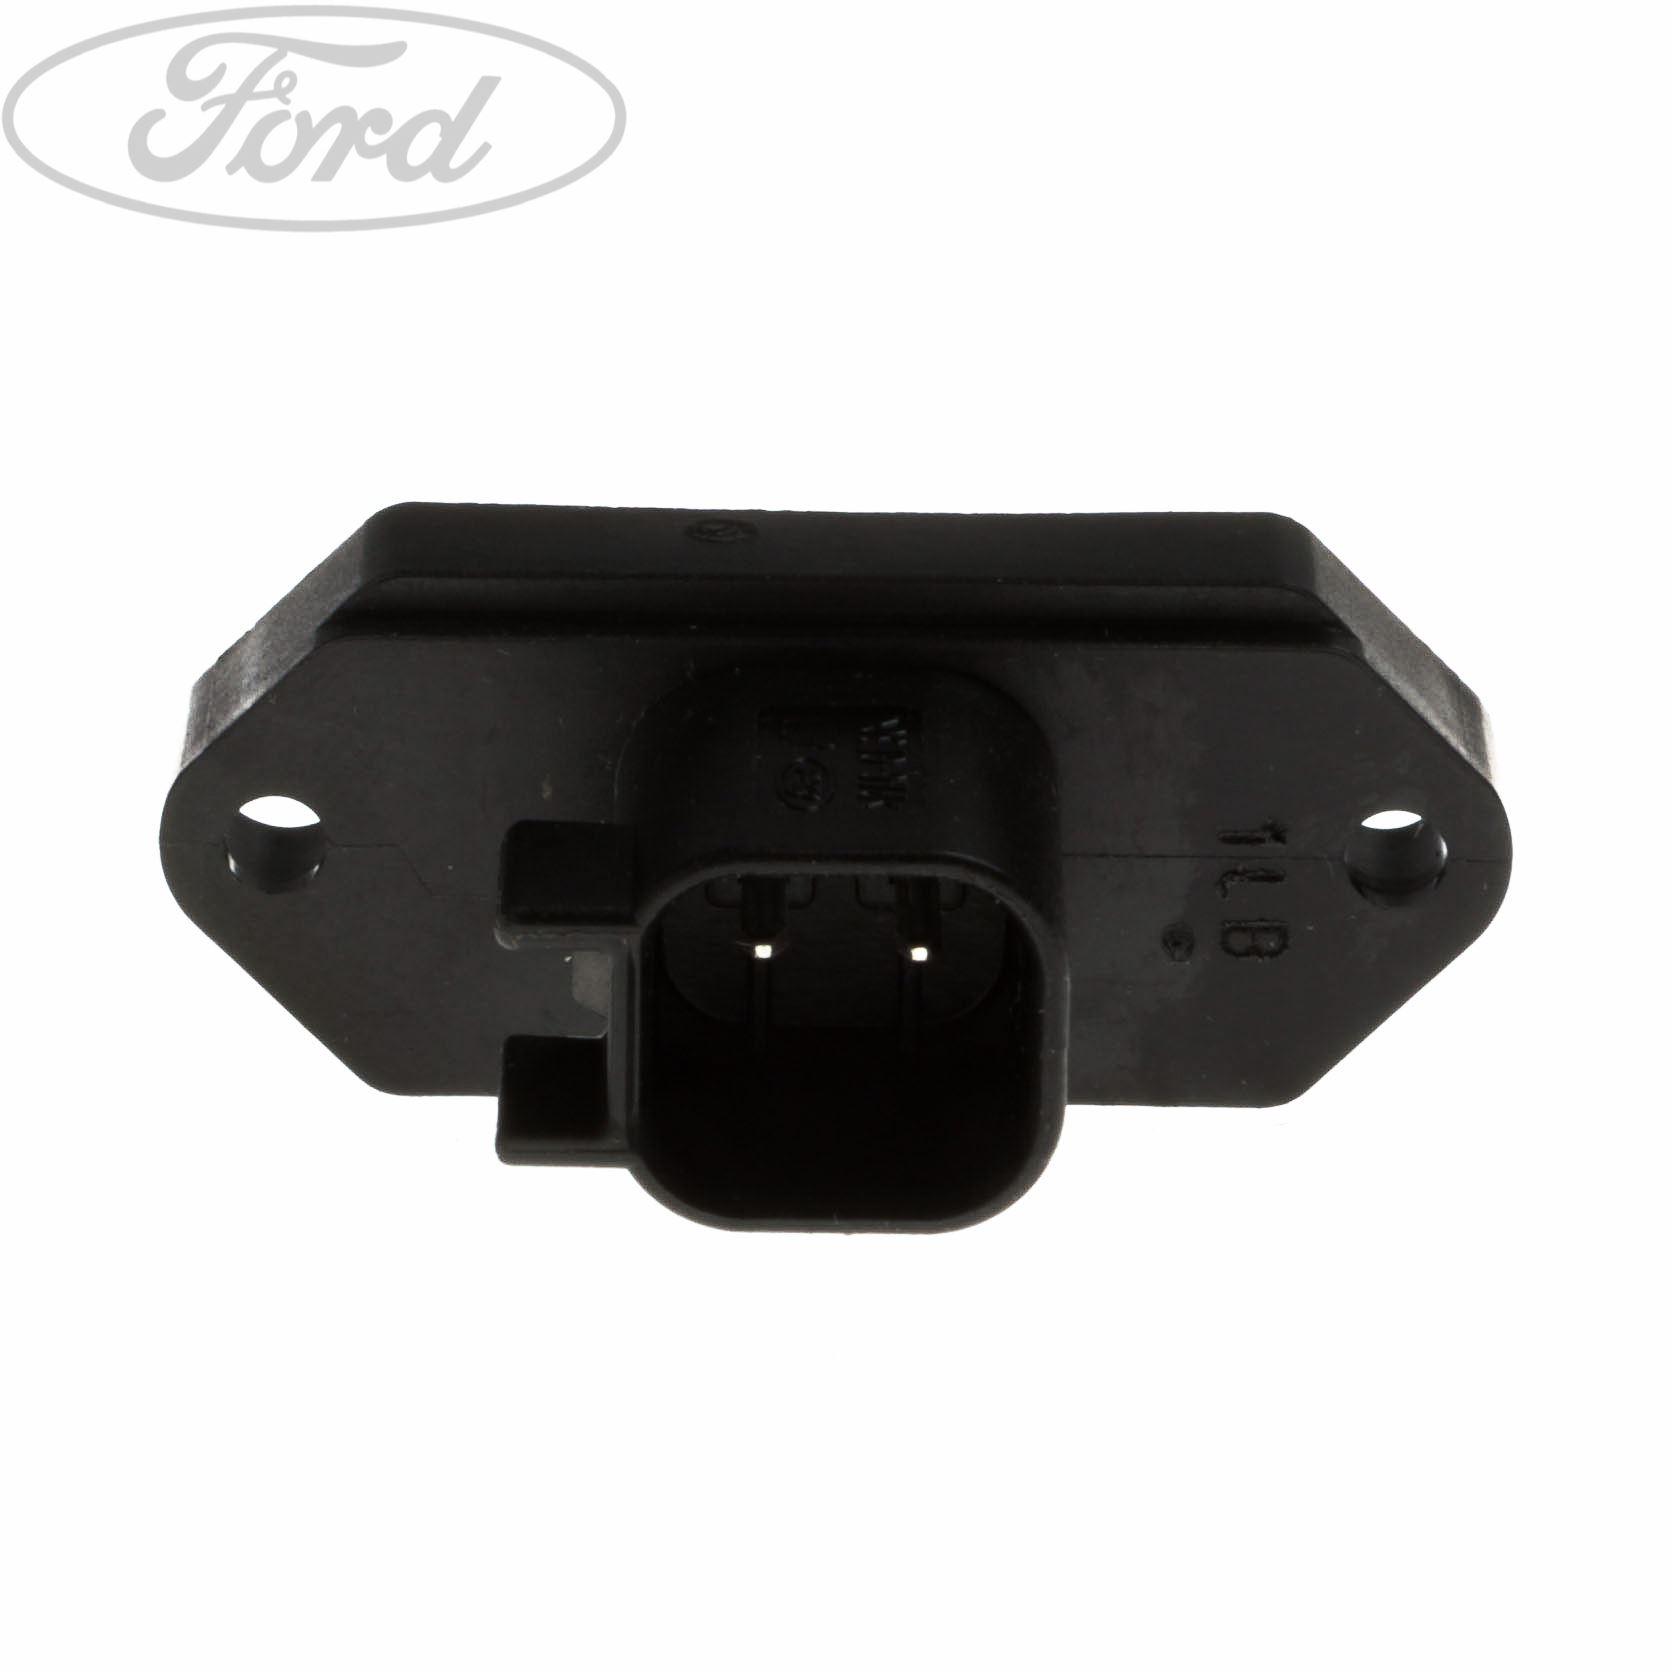 Genuine Ford Focus MK2 Focus C-Max Fuel Tank Filler Door Sensor 1306089